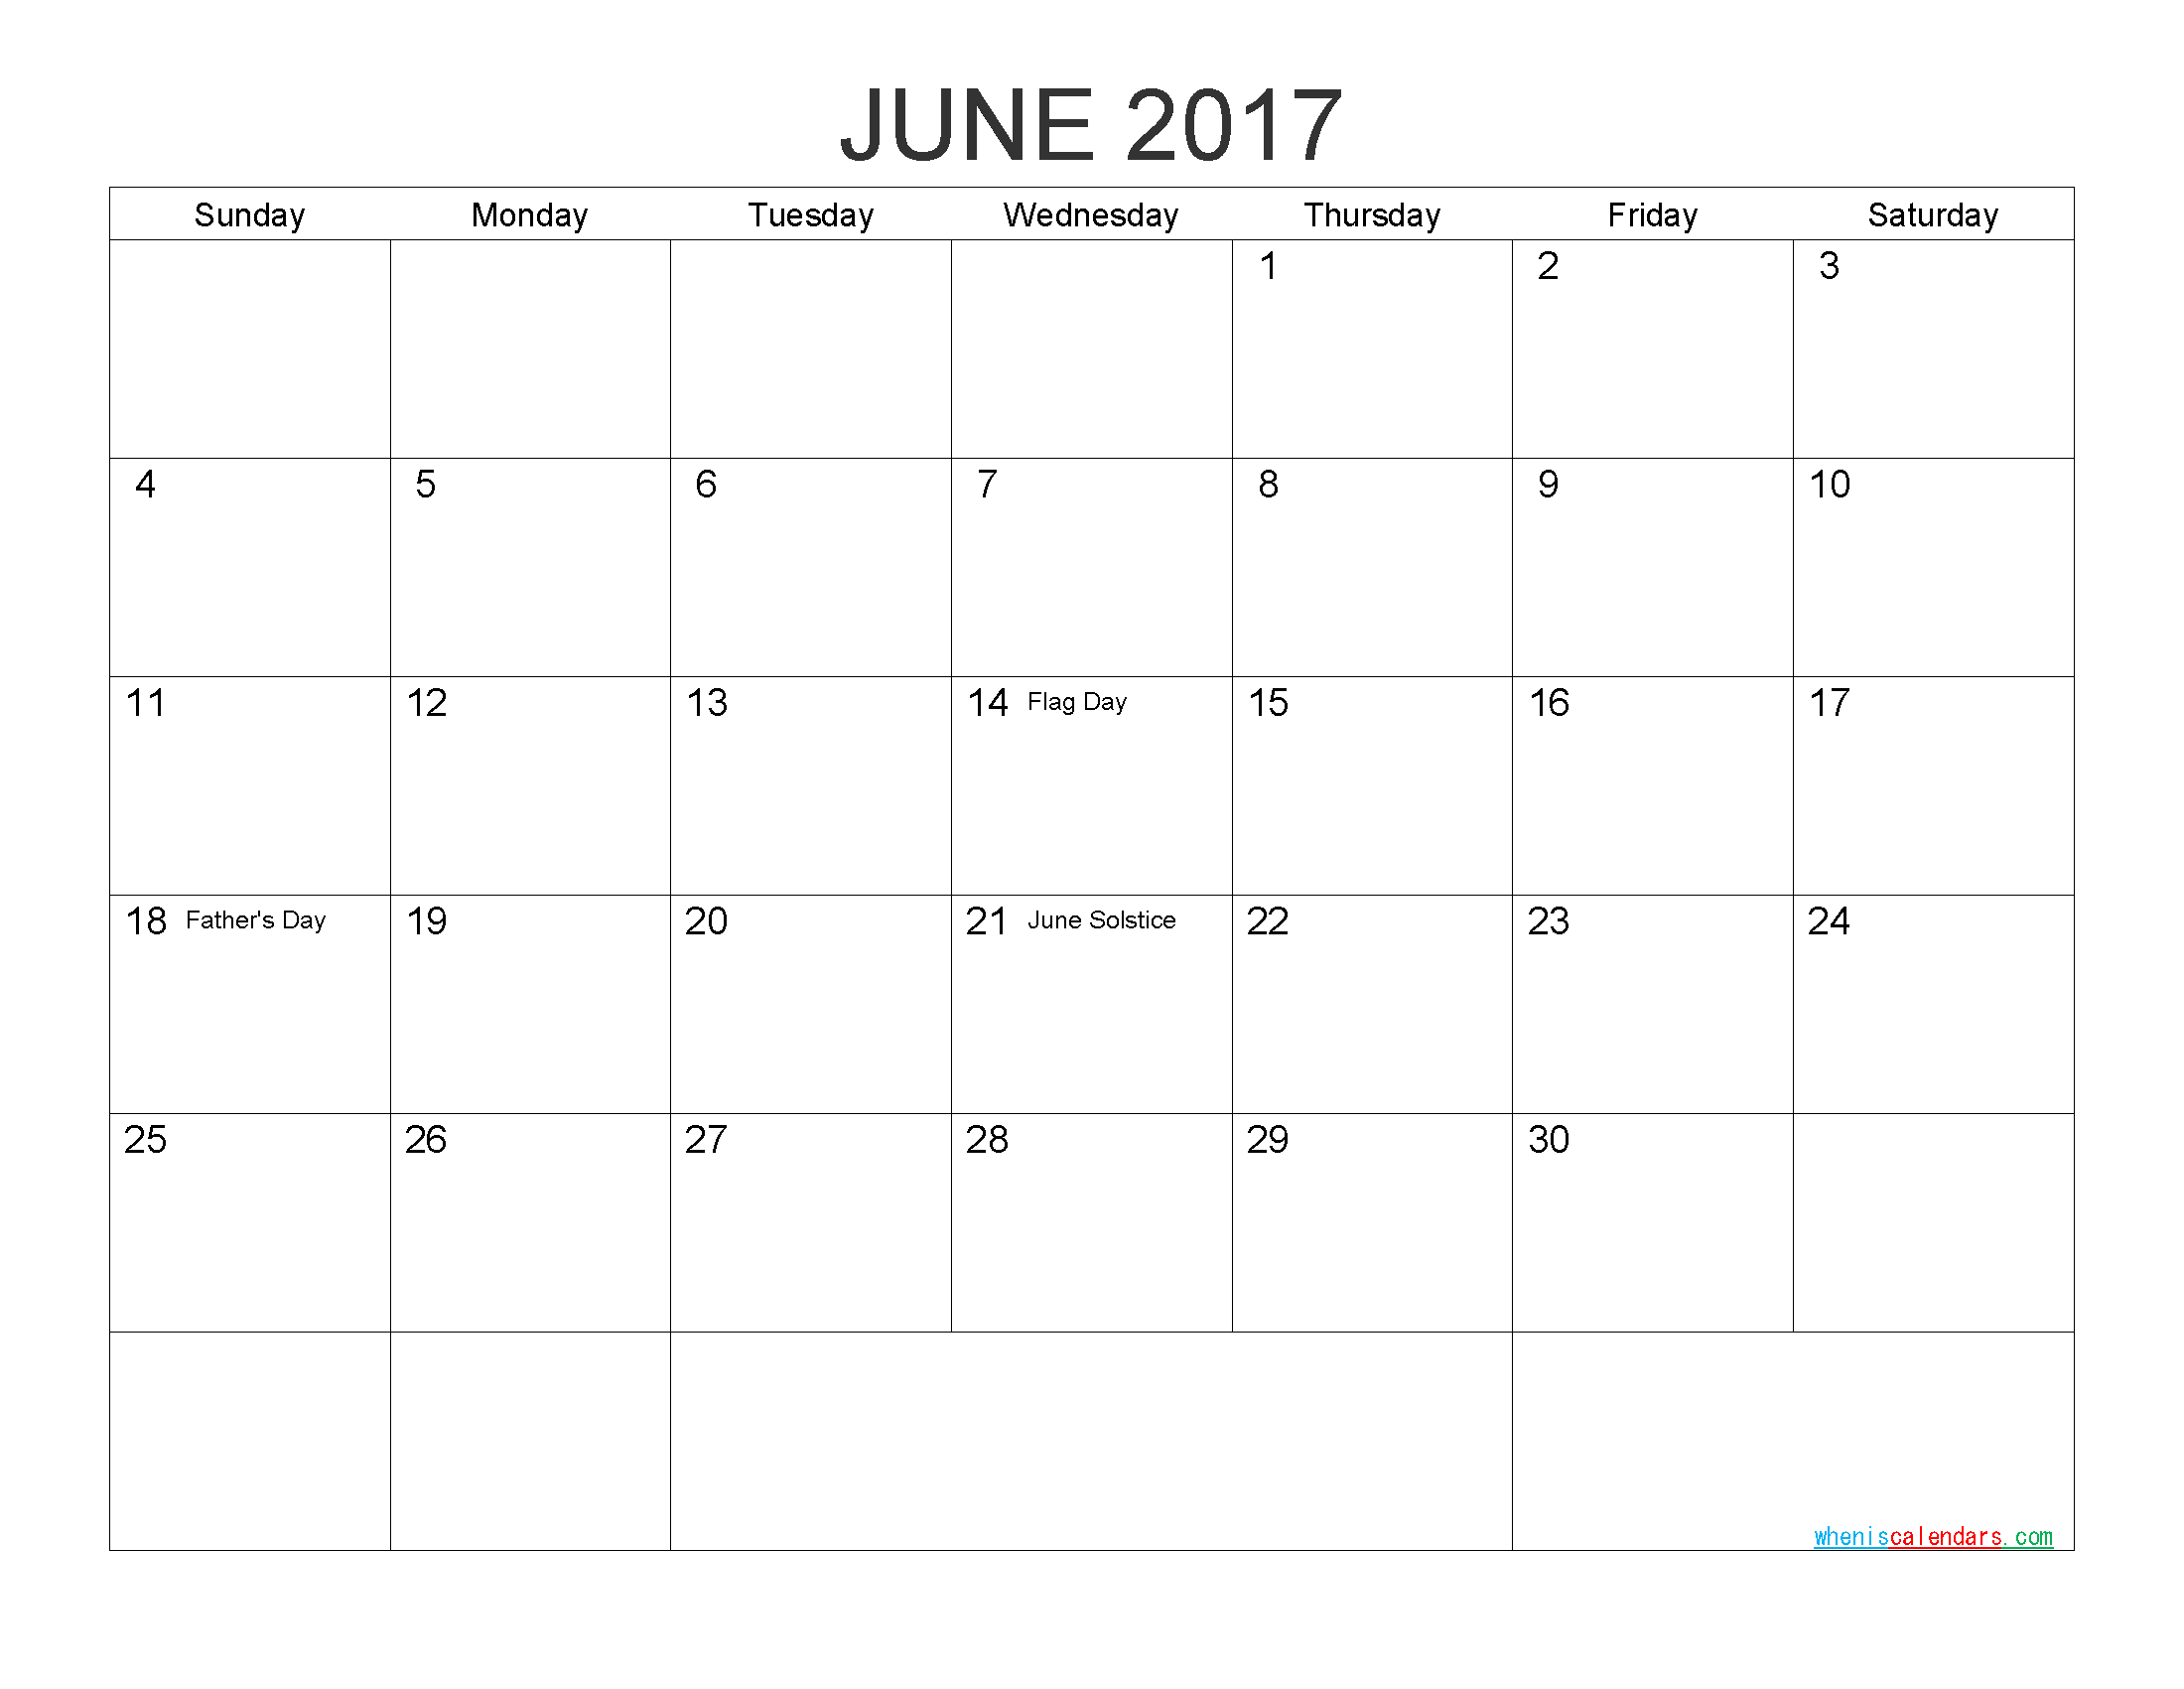 6 2017 calendar HolSuInk